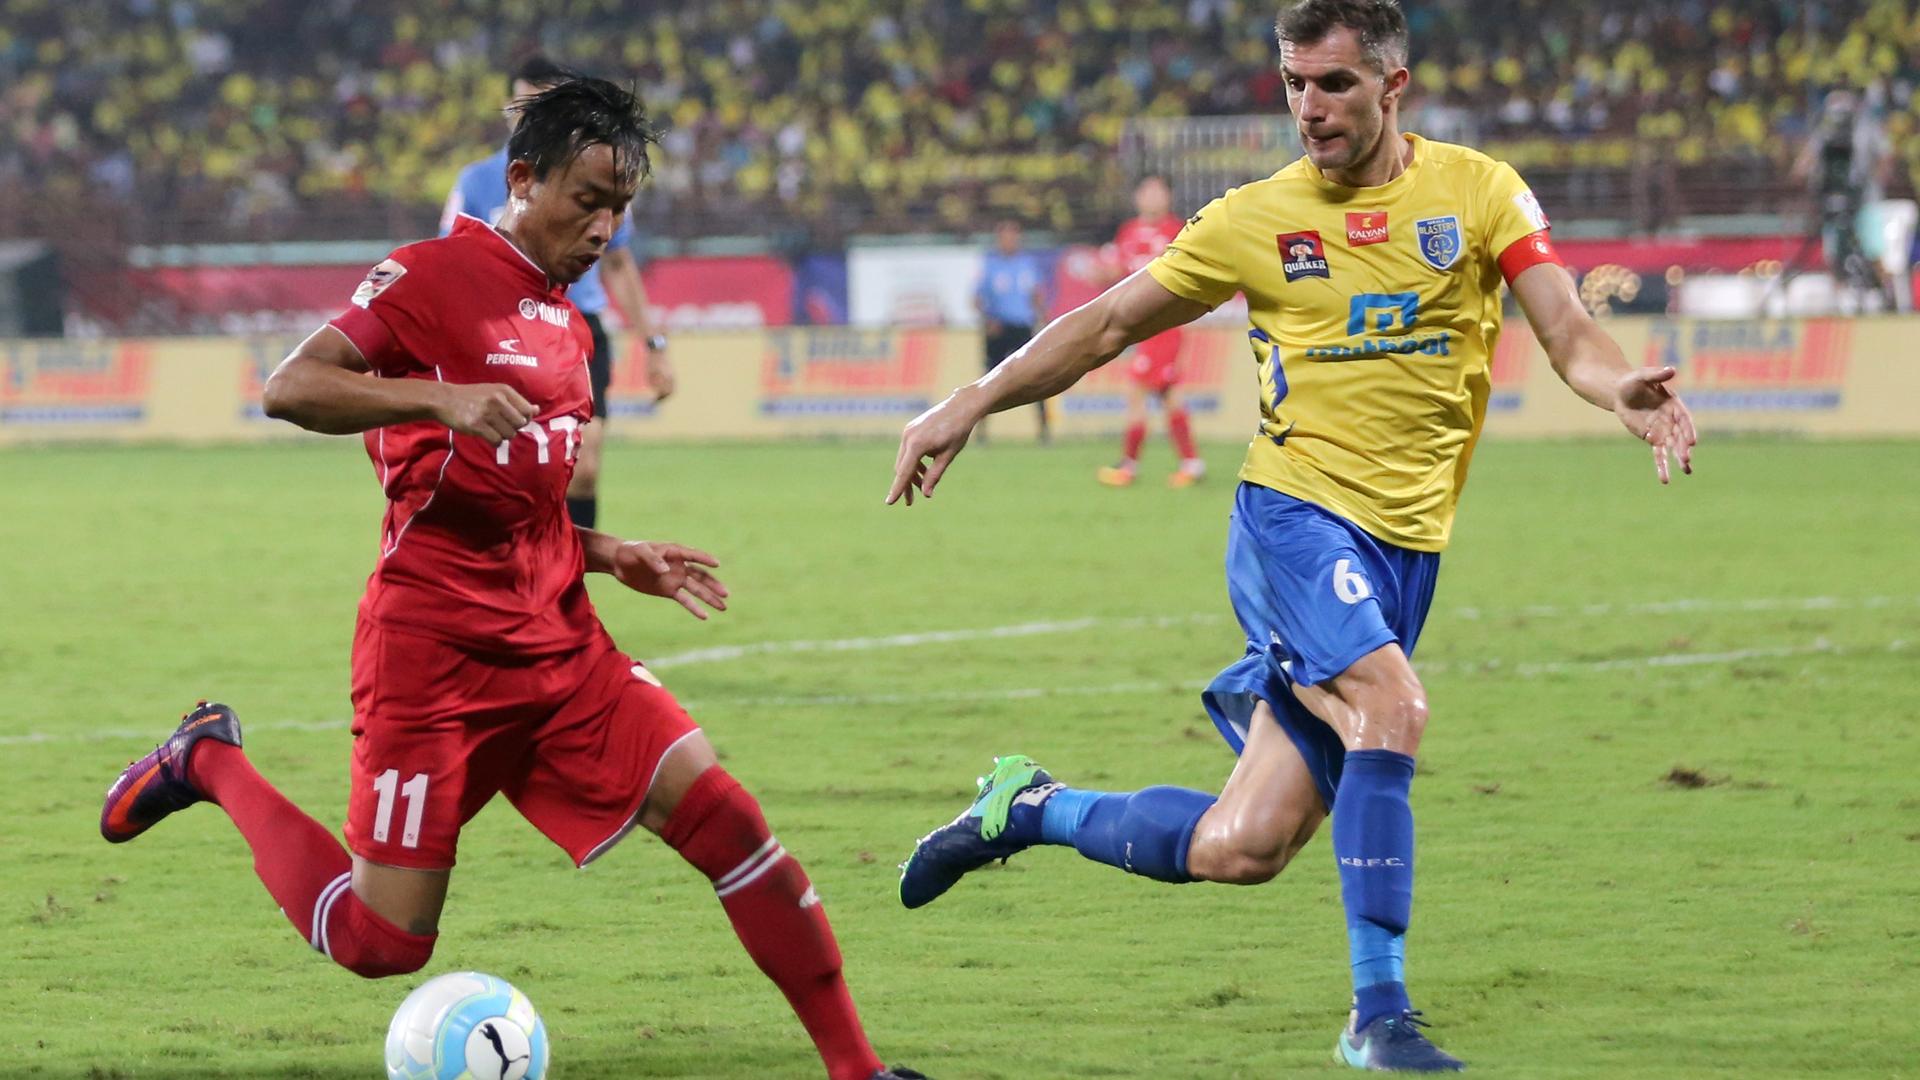 Seityasen Singh Kerala Blasters FC NorthEast United FC ISL season 3 2016